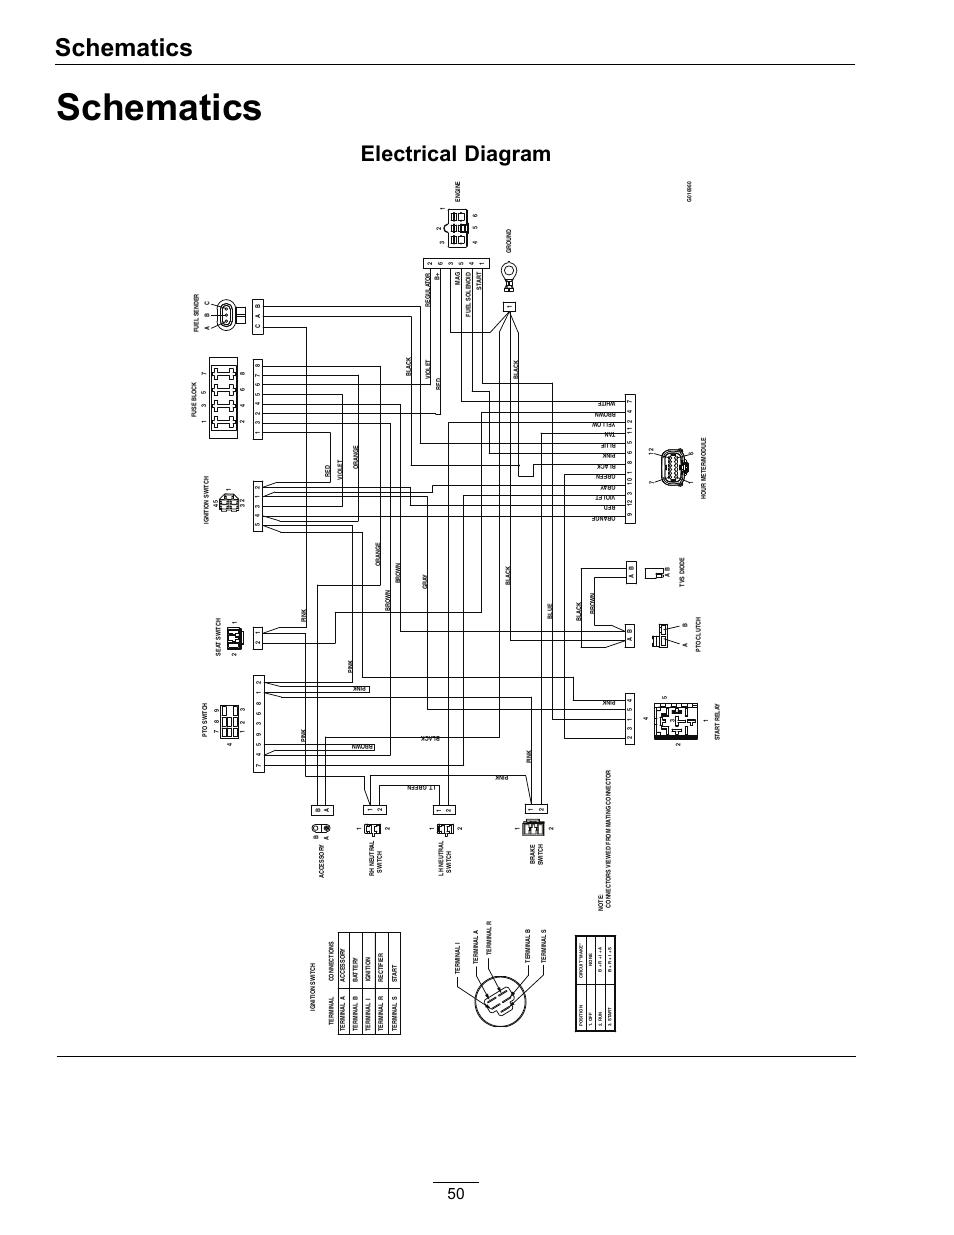 Chevrolet P30 Wiring Diagrams Battery Isolator : 1985 p30 step van turn signal wiring diagram ~ A.2002-acura-tl-radio.info Haus und Dekorationen